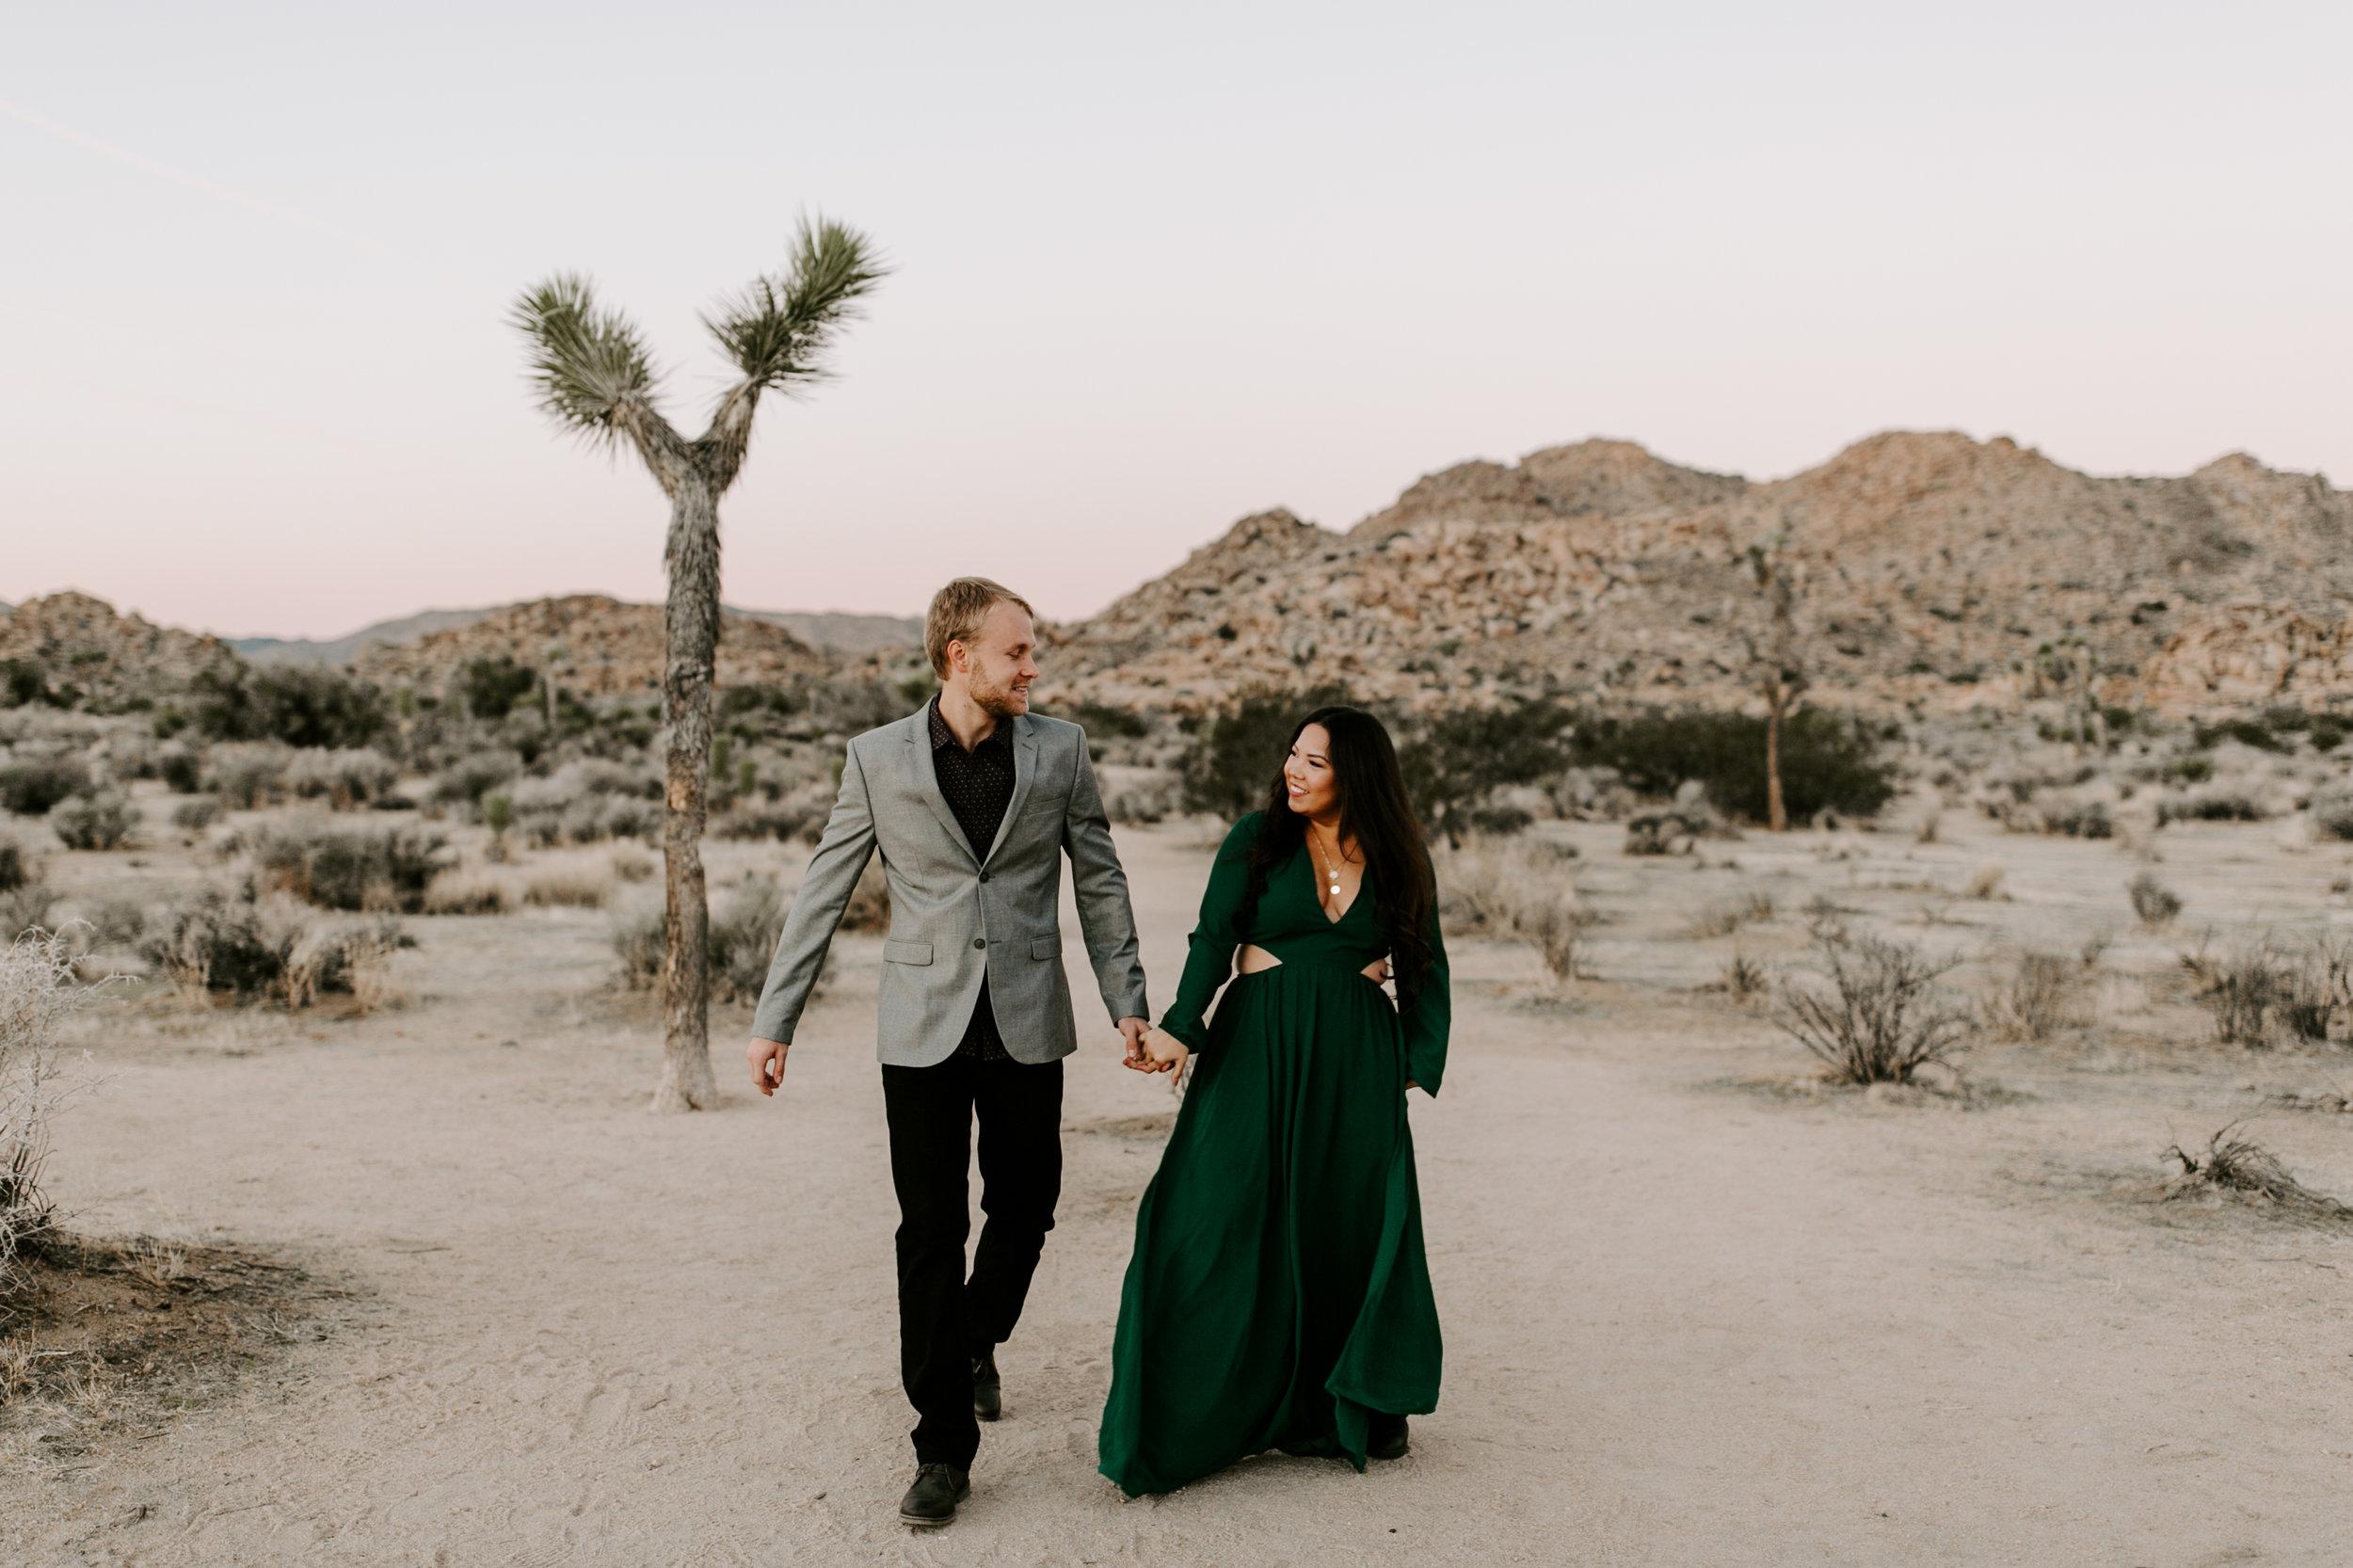 joshua-tree-elopement-photographer-california-wedding-photographer-1.jpg